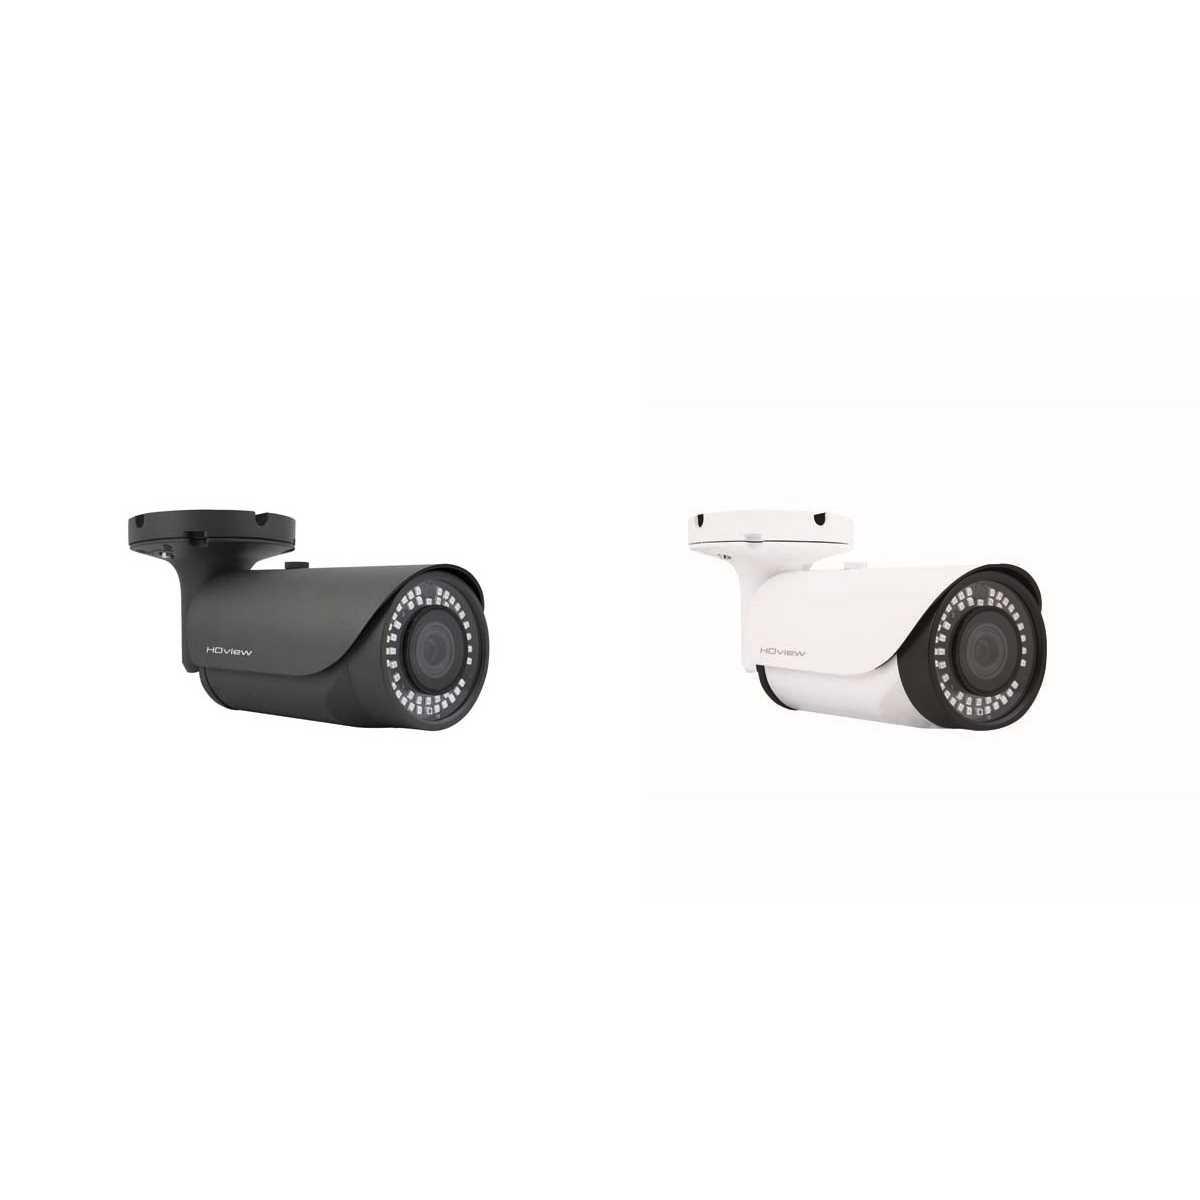 ESP 5-50mm Lens 4MP Super HD Grey White Bullet CCTV Cameras